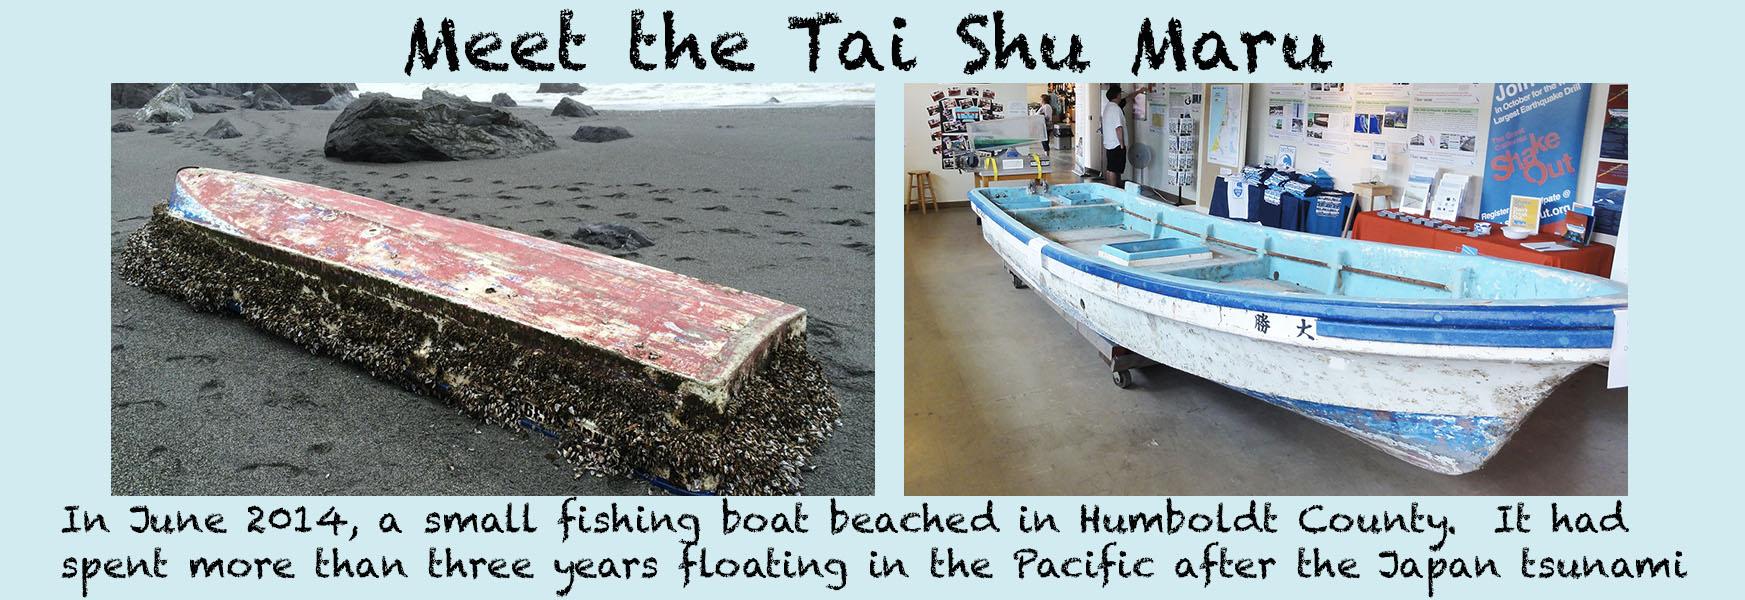 Meet the Tai Shu Maru